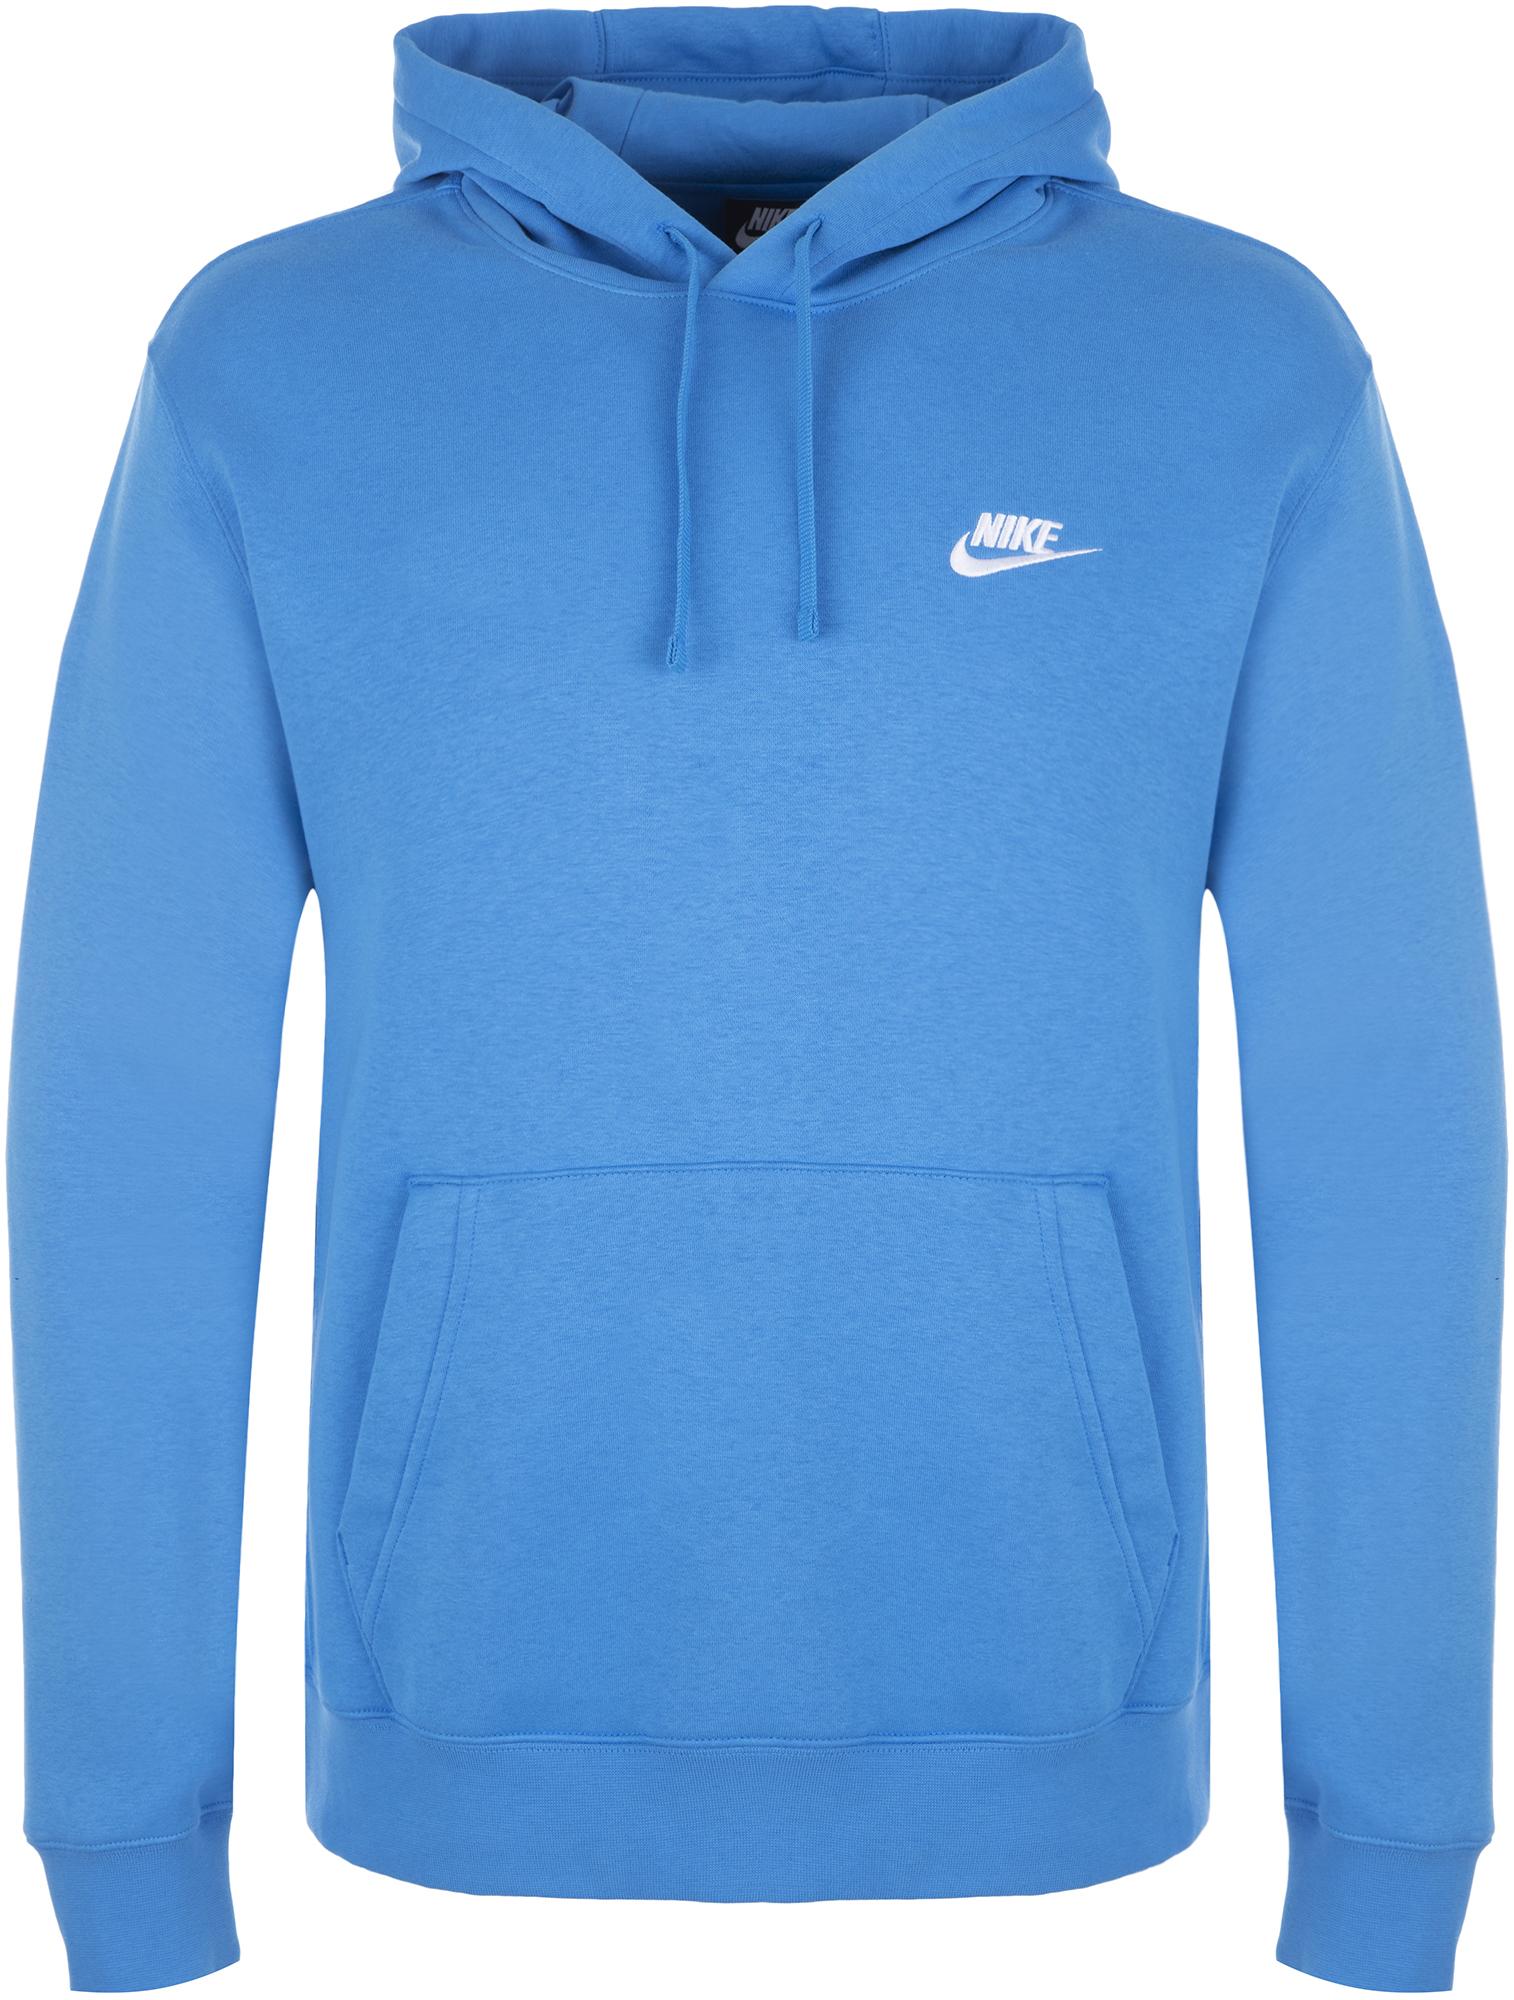 Nike Худи мужская Club, размер 52-54